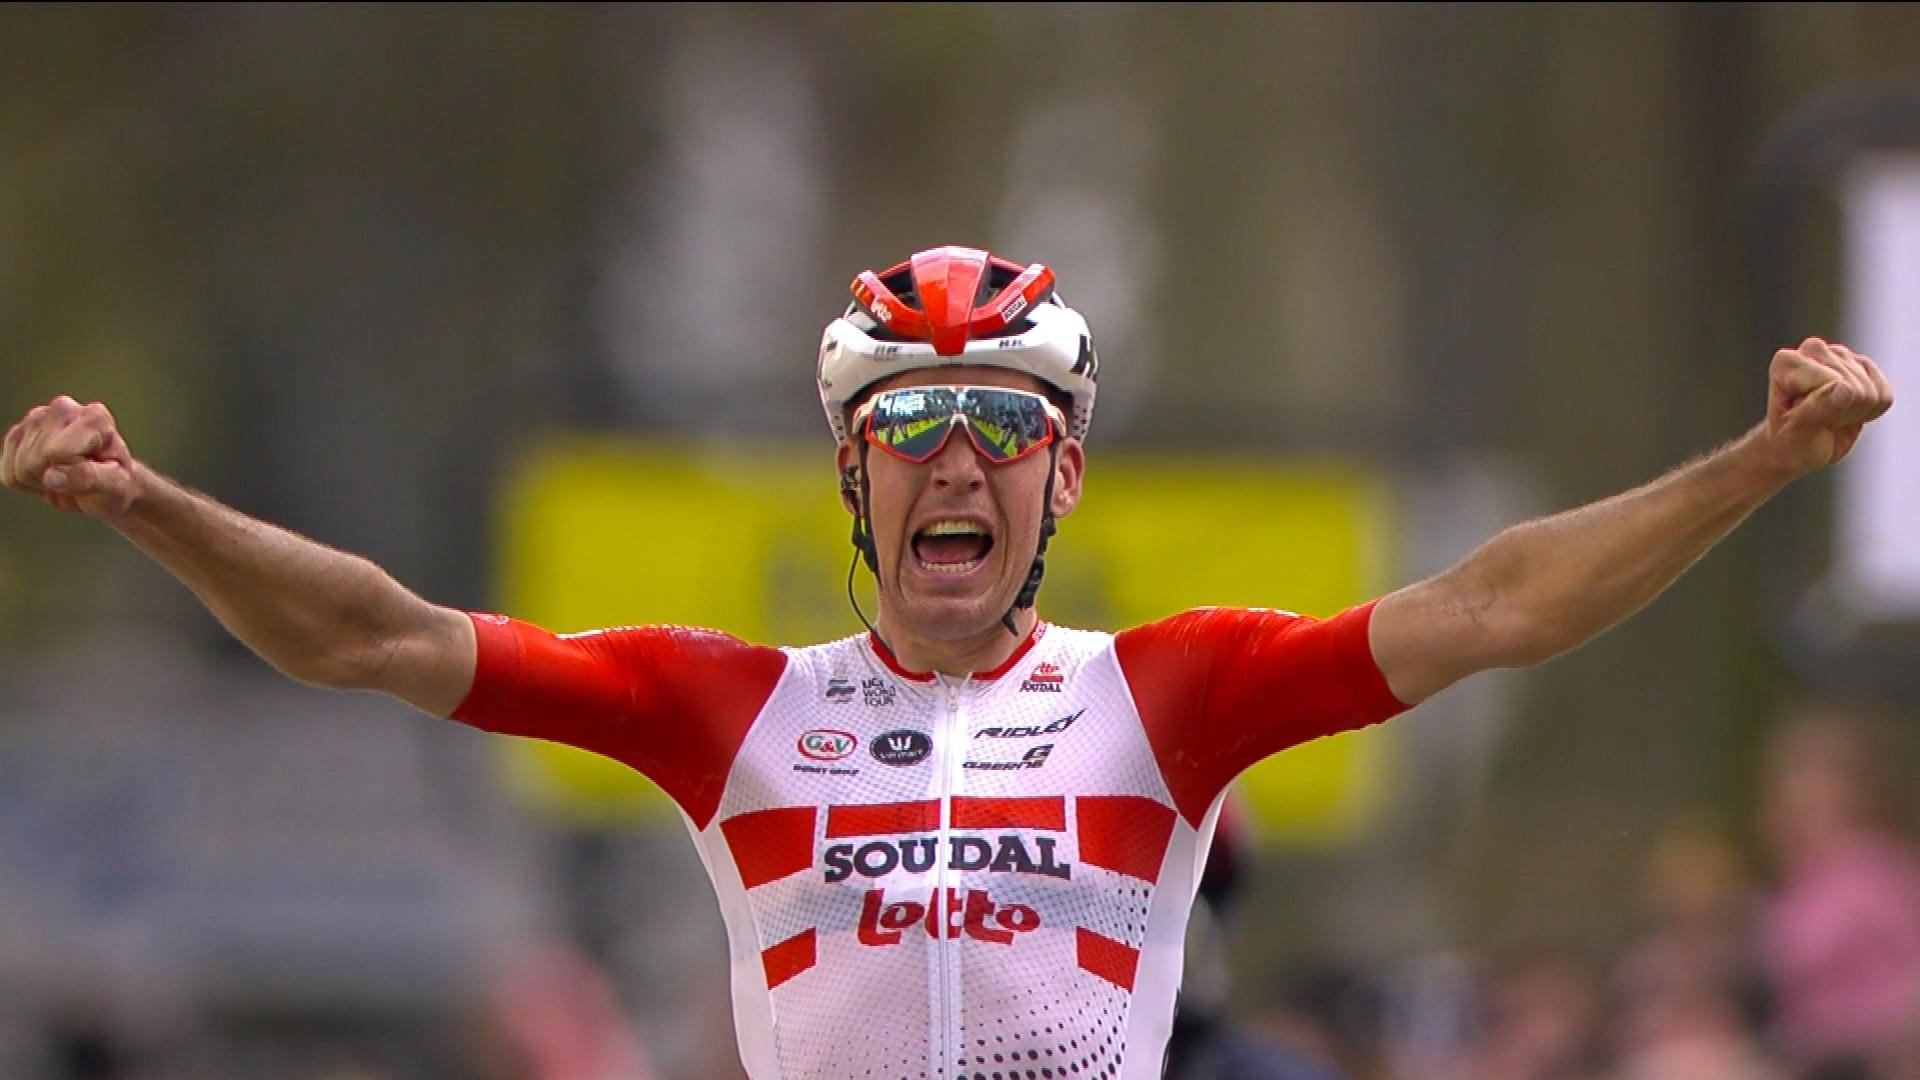 Jelle Wallays of Belgium wins Paris-Tours 2019 by 30-second margin